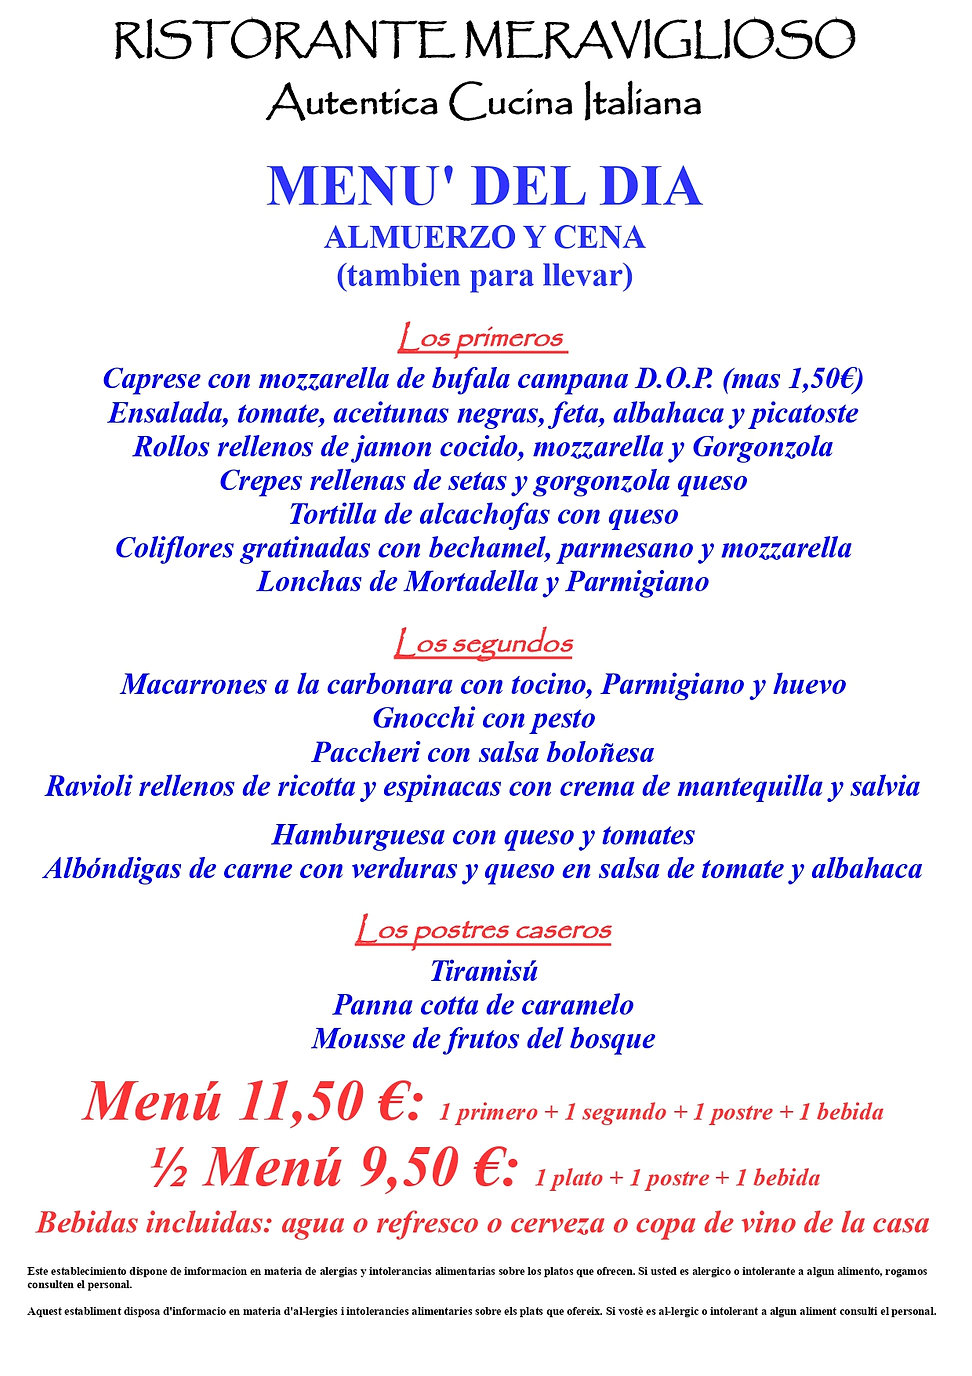 menù del dia_page-0001 (44).jpg